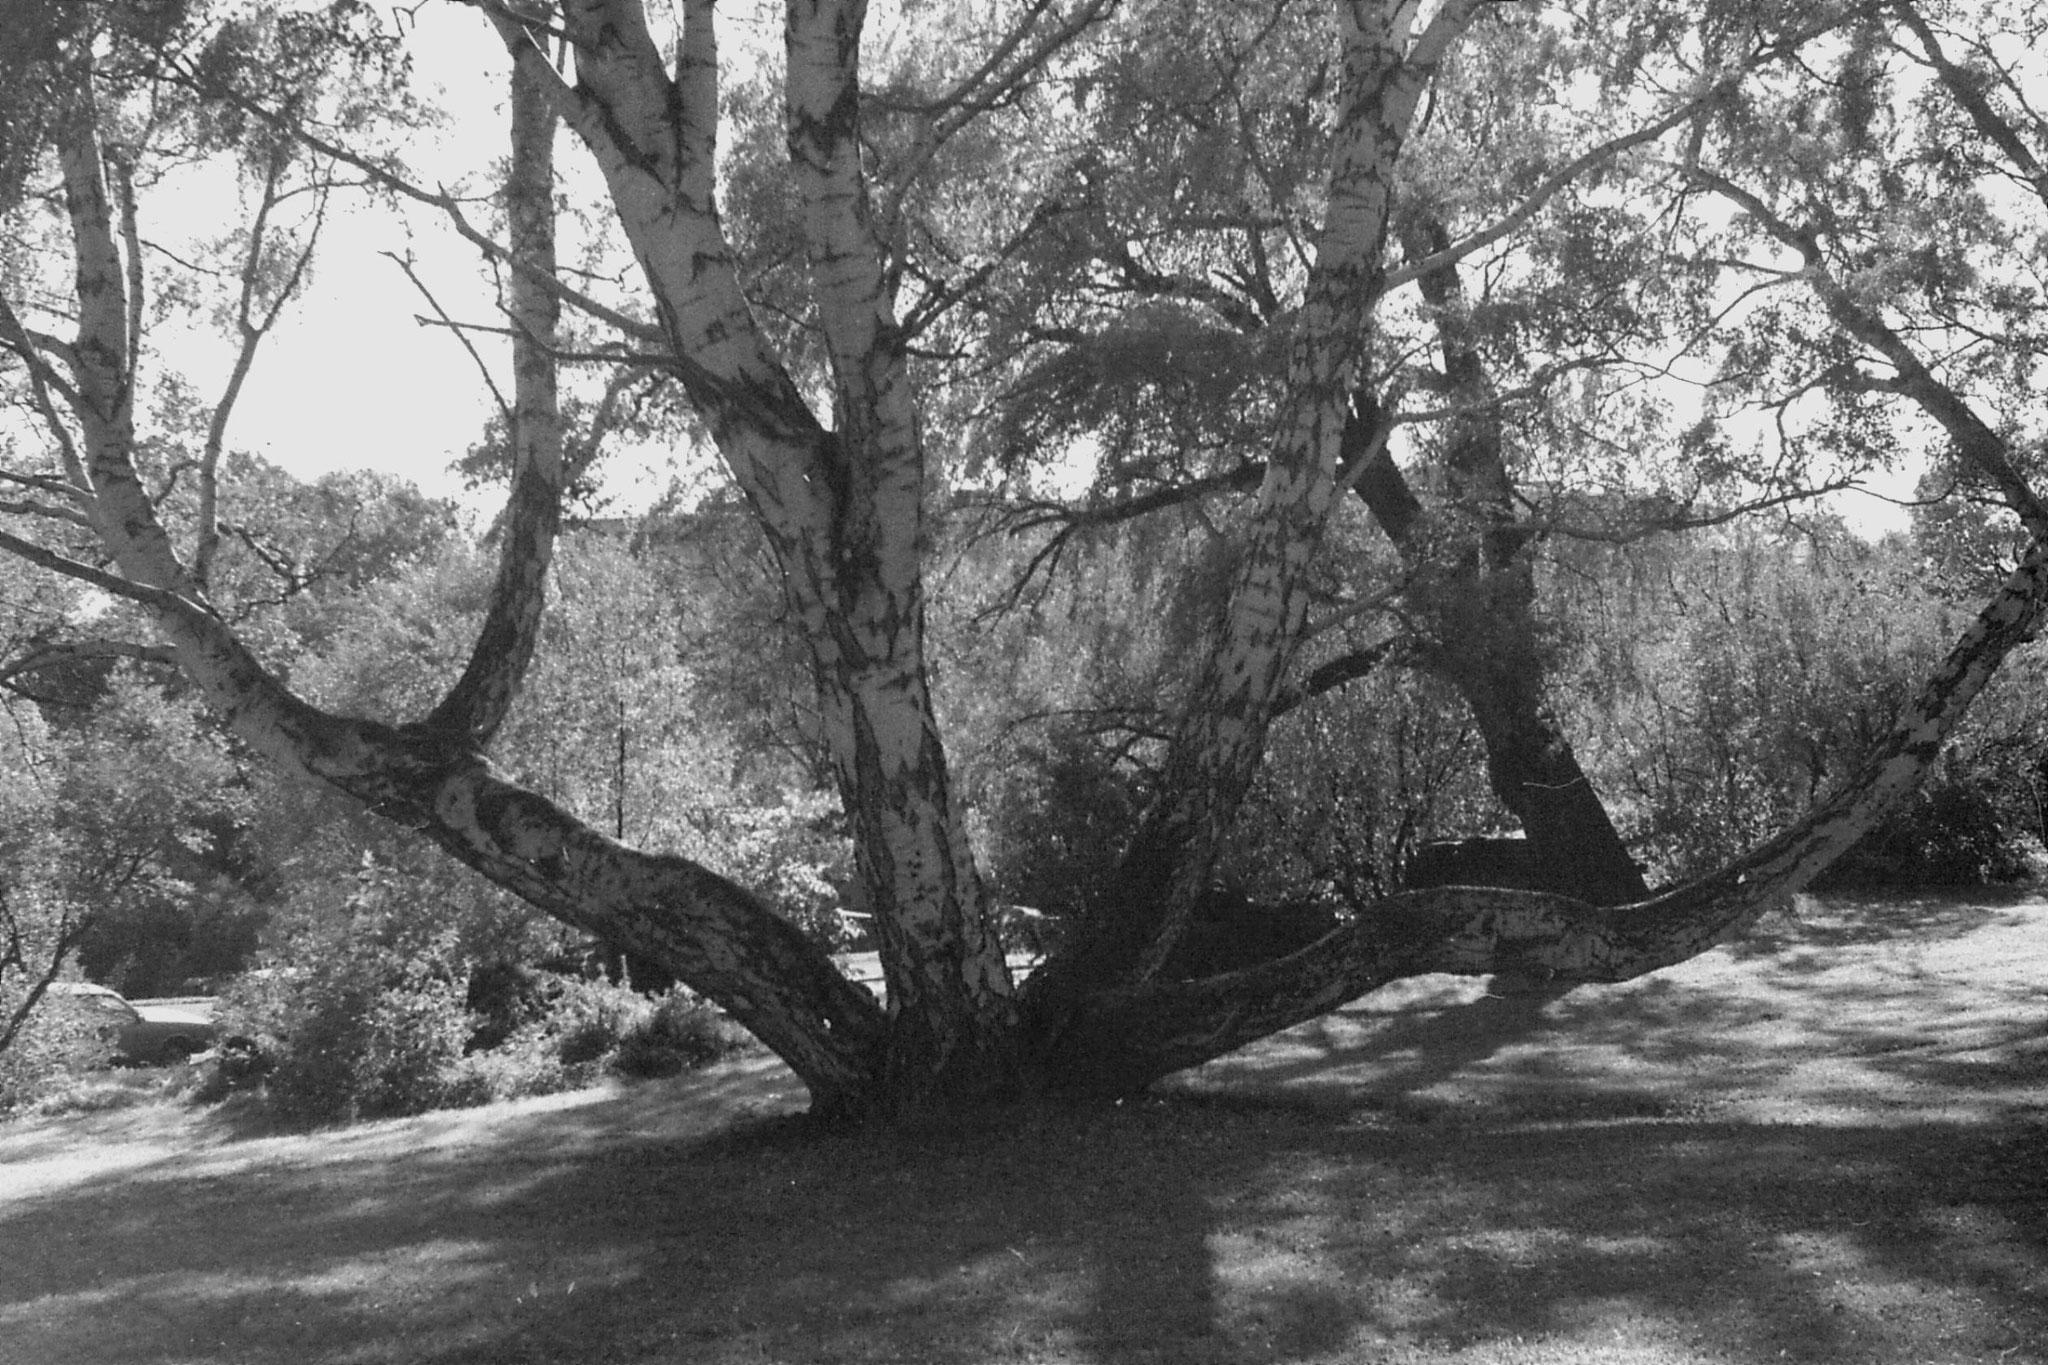 30/9/1988: 6: birch tree trunks